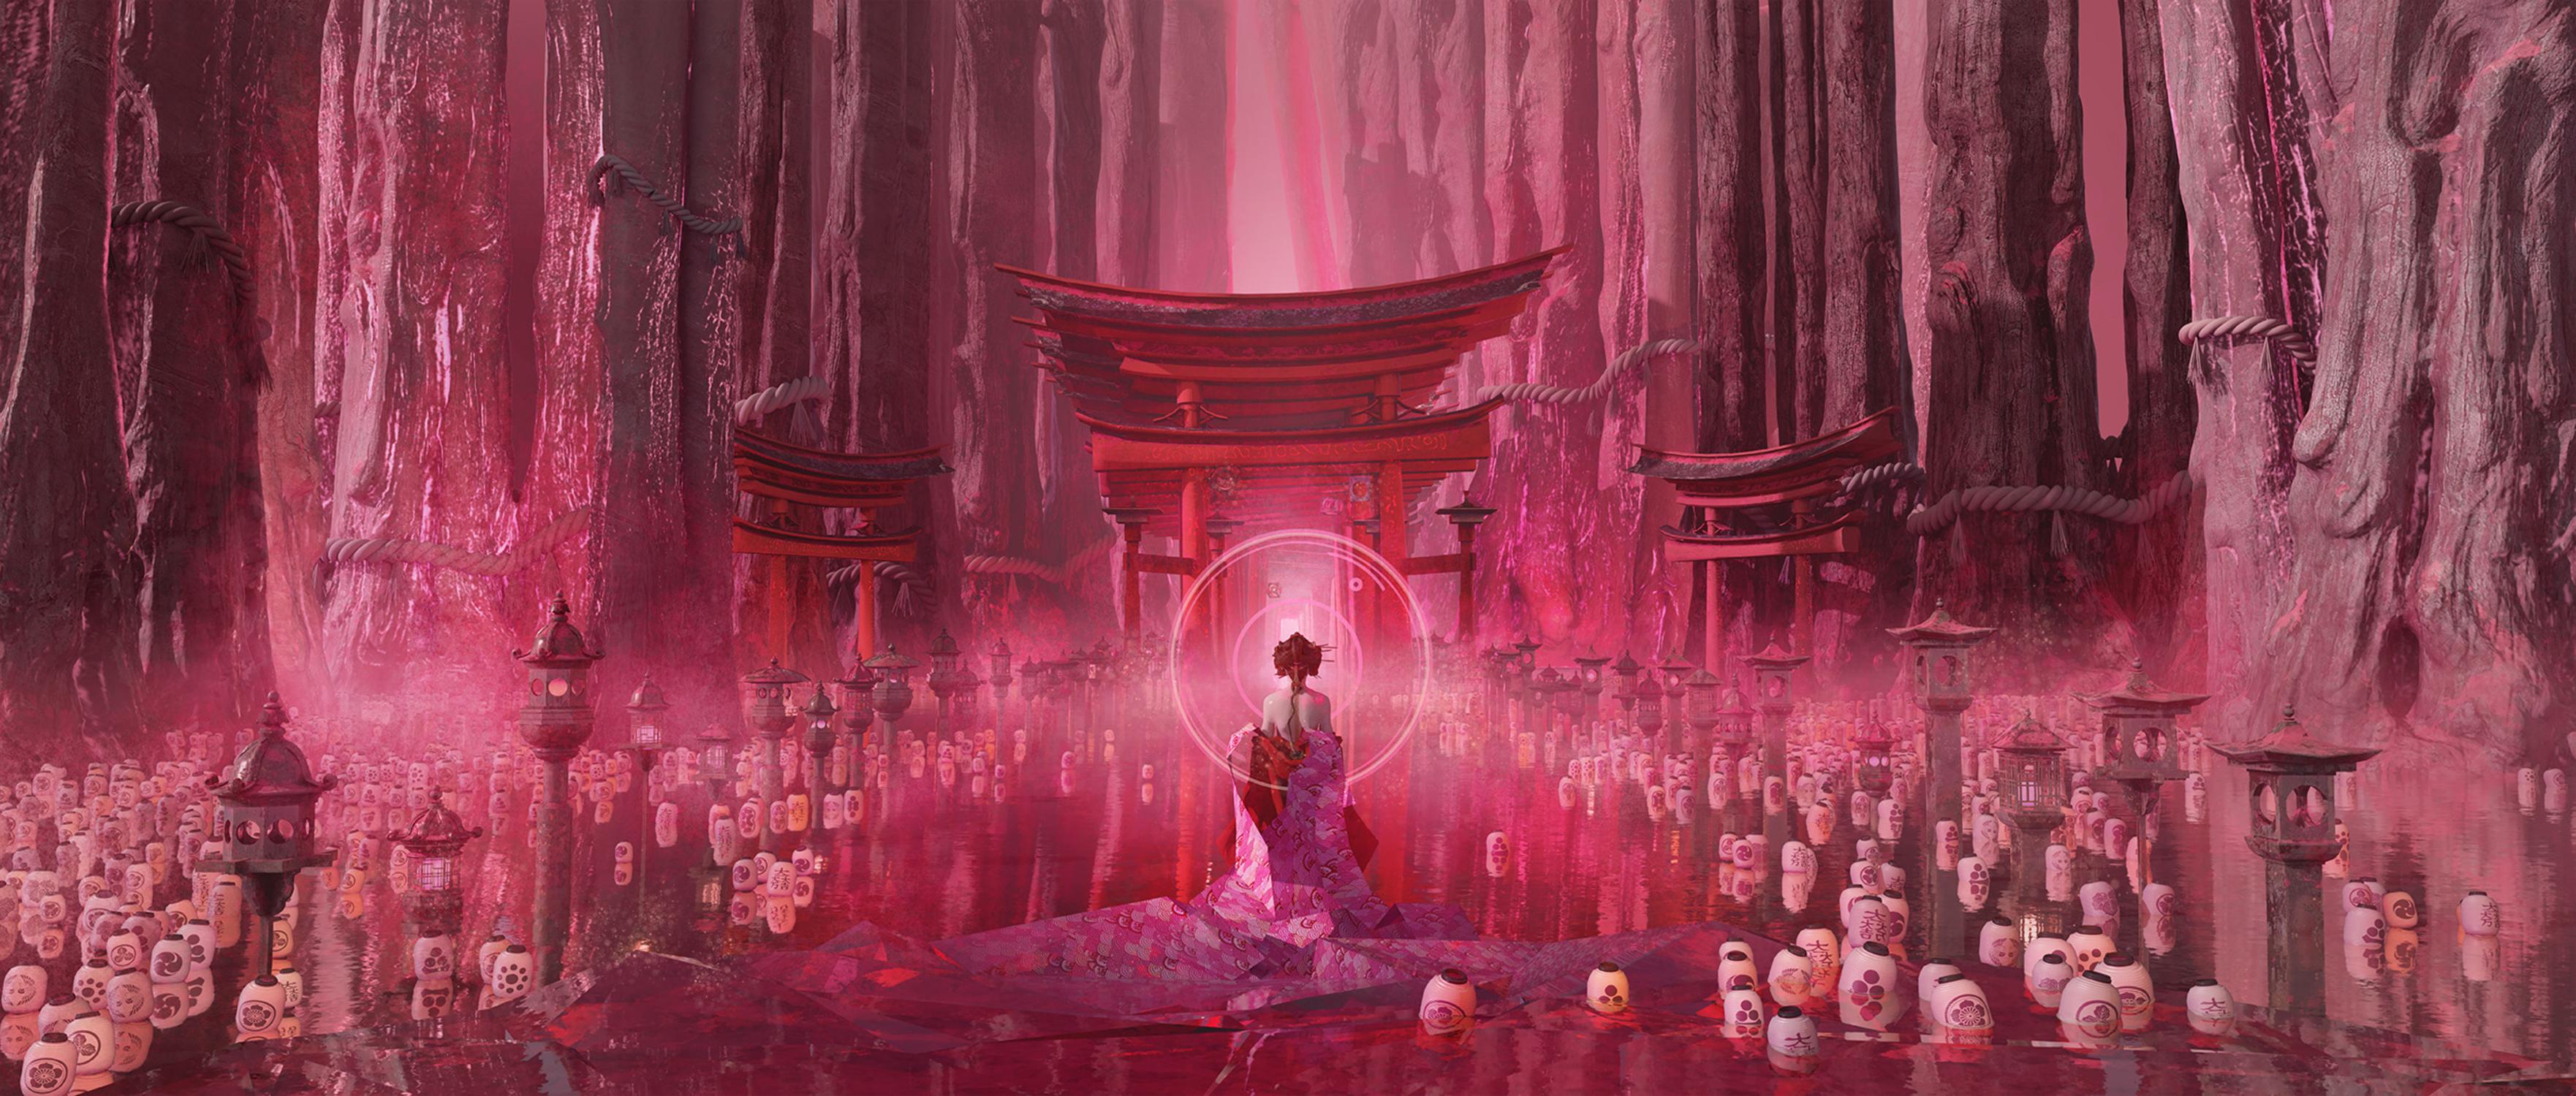 sacrifice for the great Torii Artwork by TE HU